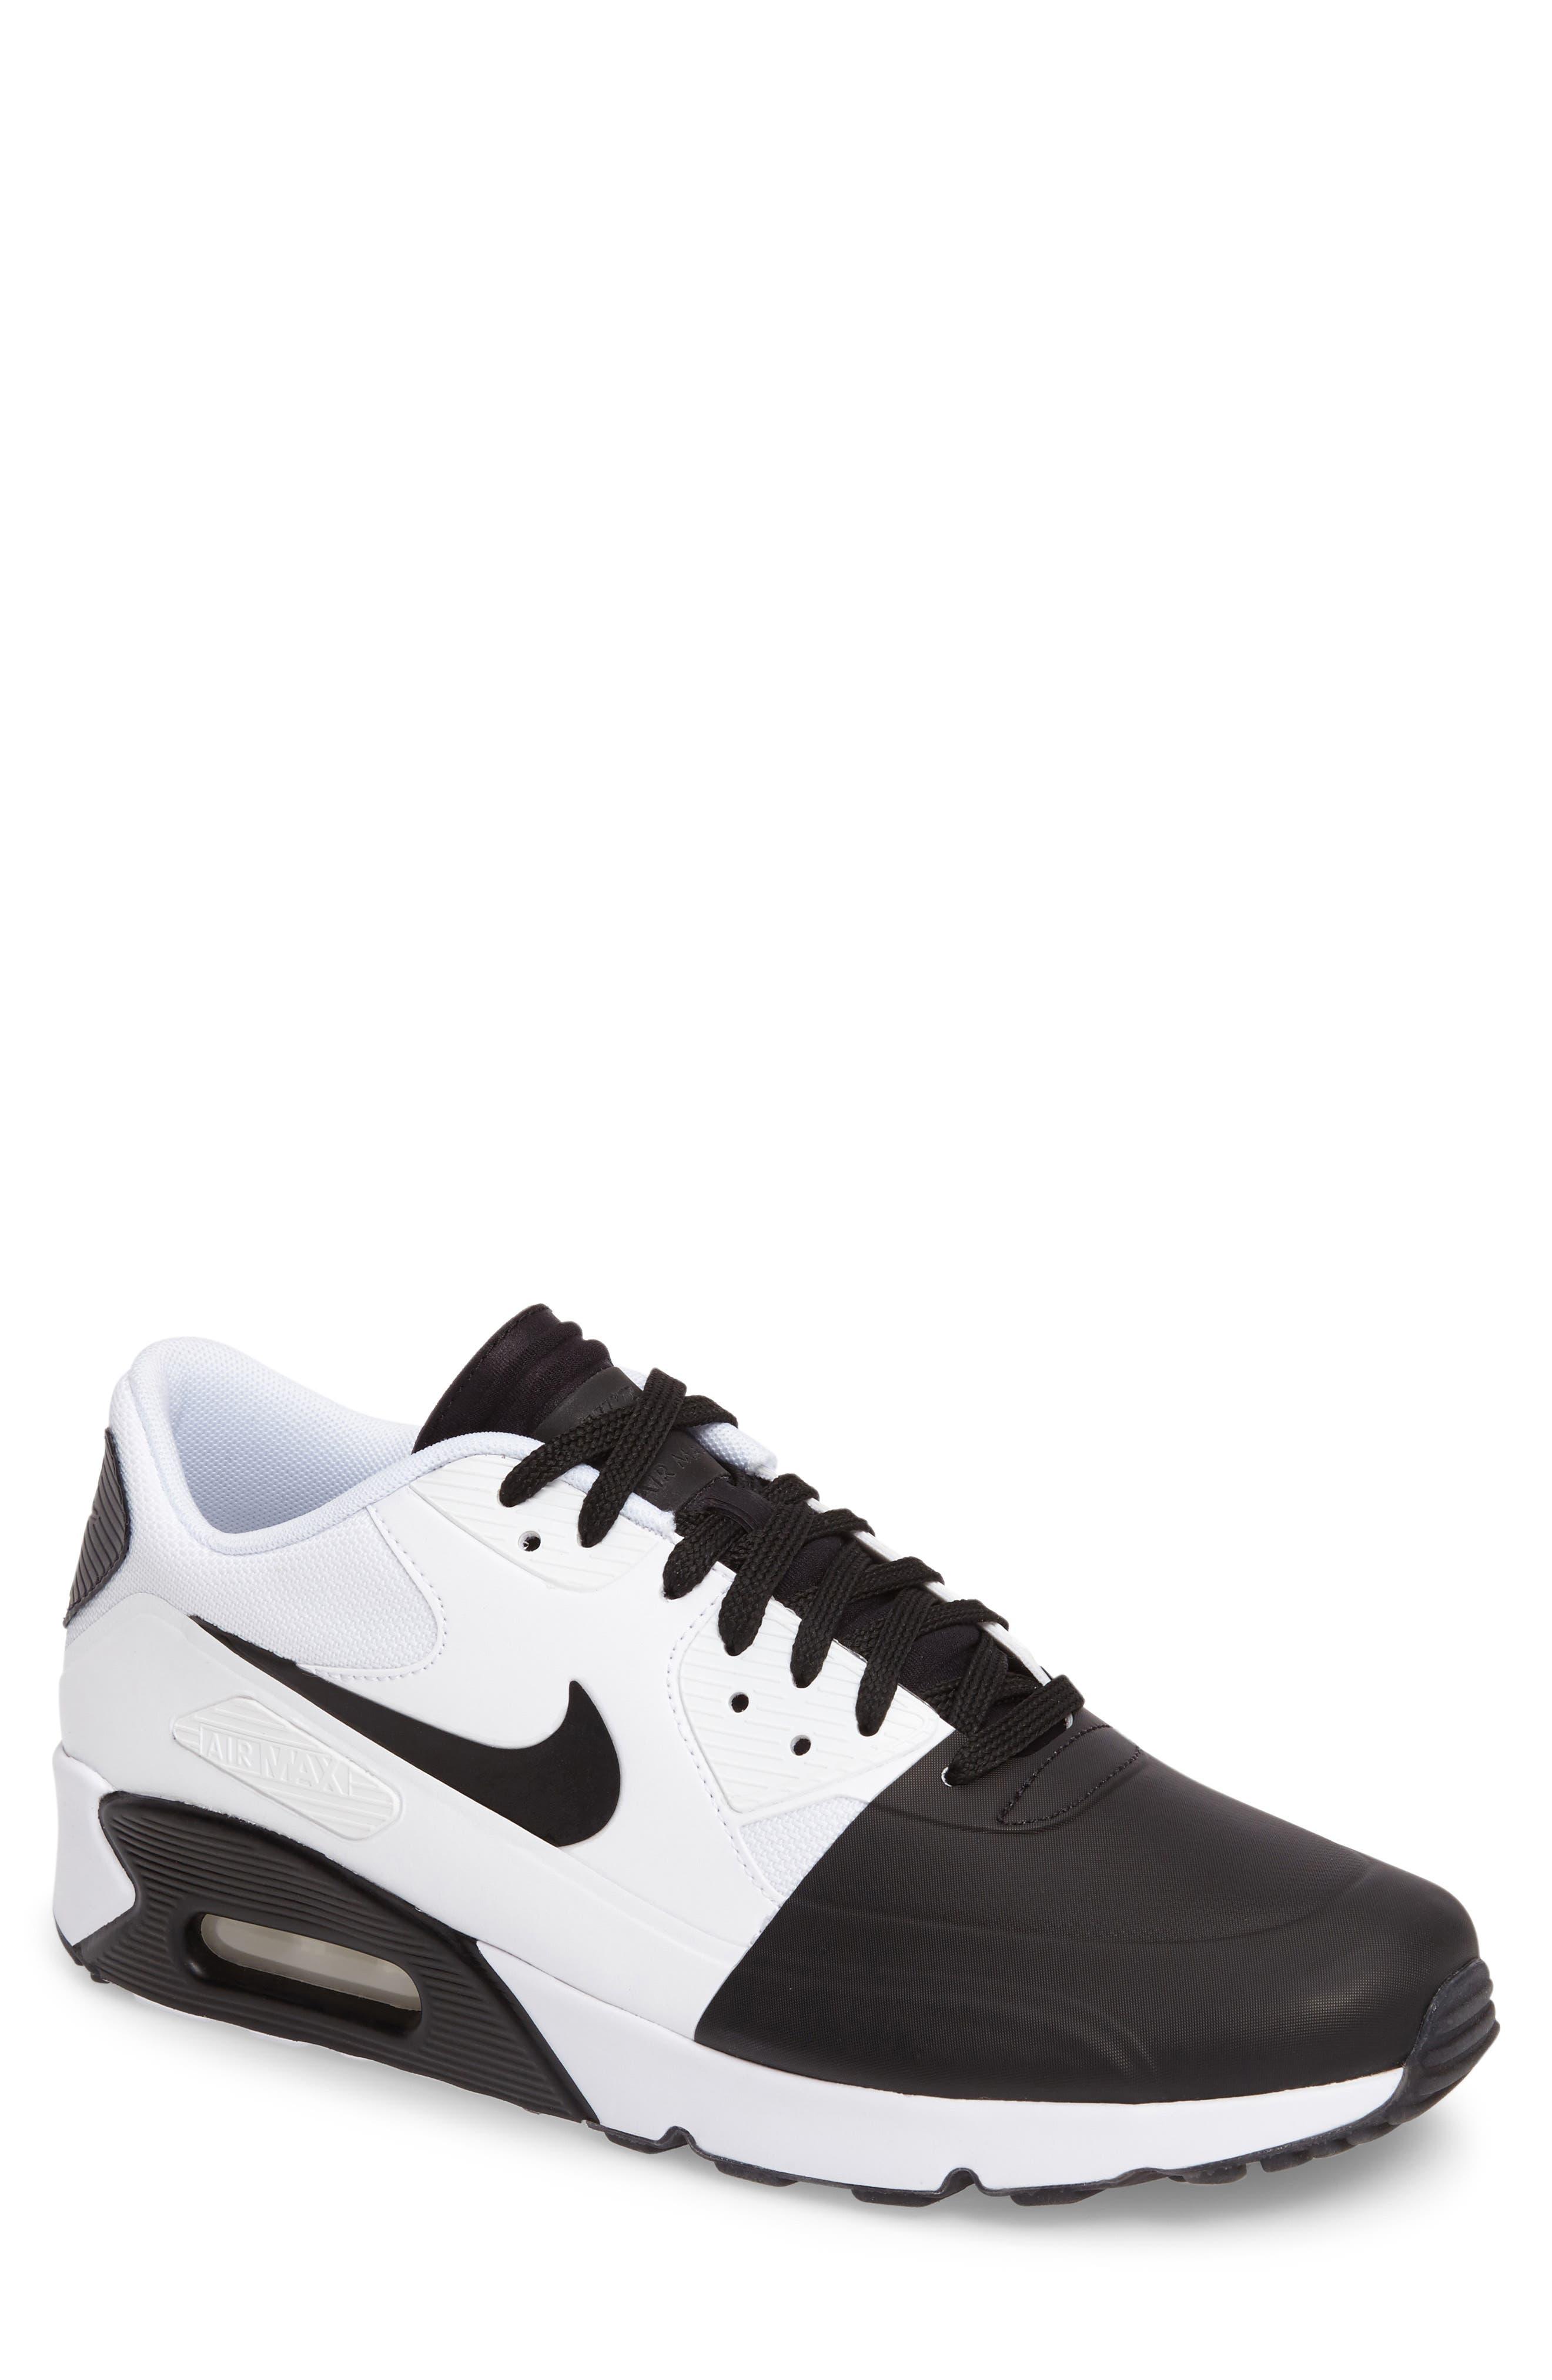 Air Max 90 Ultra 2.0 SE Sneaker,                             Main thumbnail 4, color,